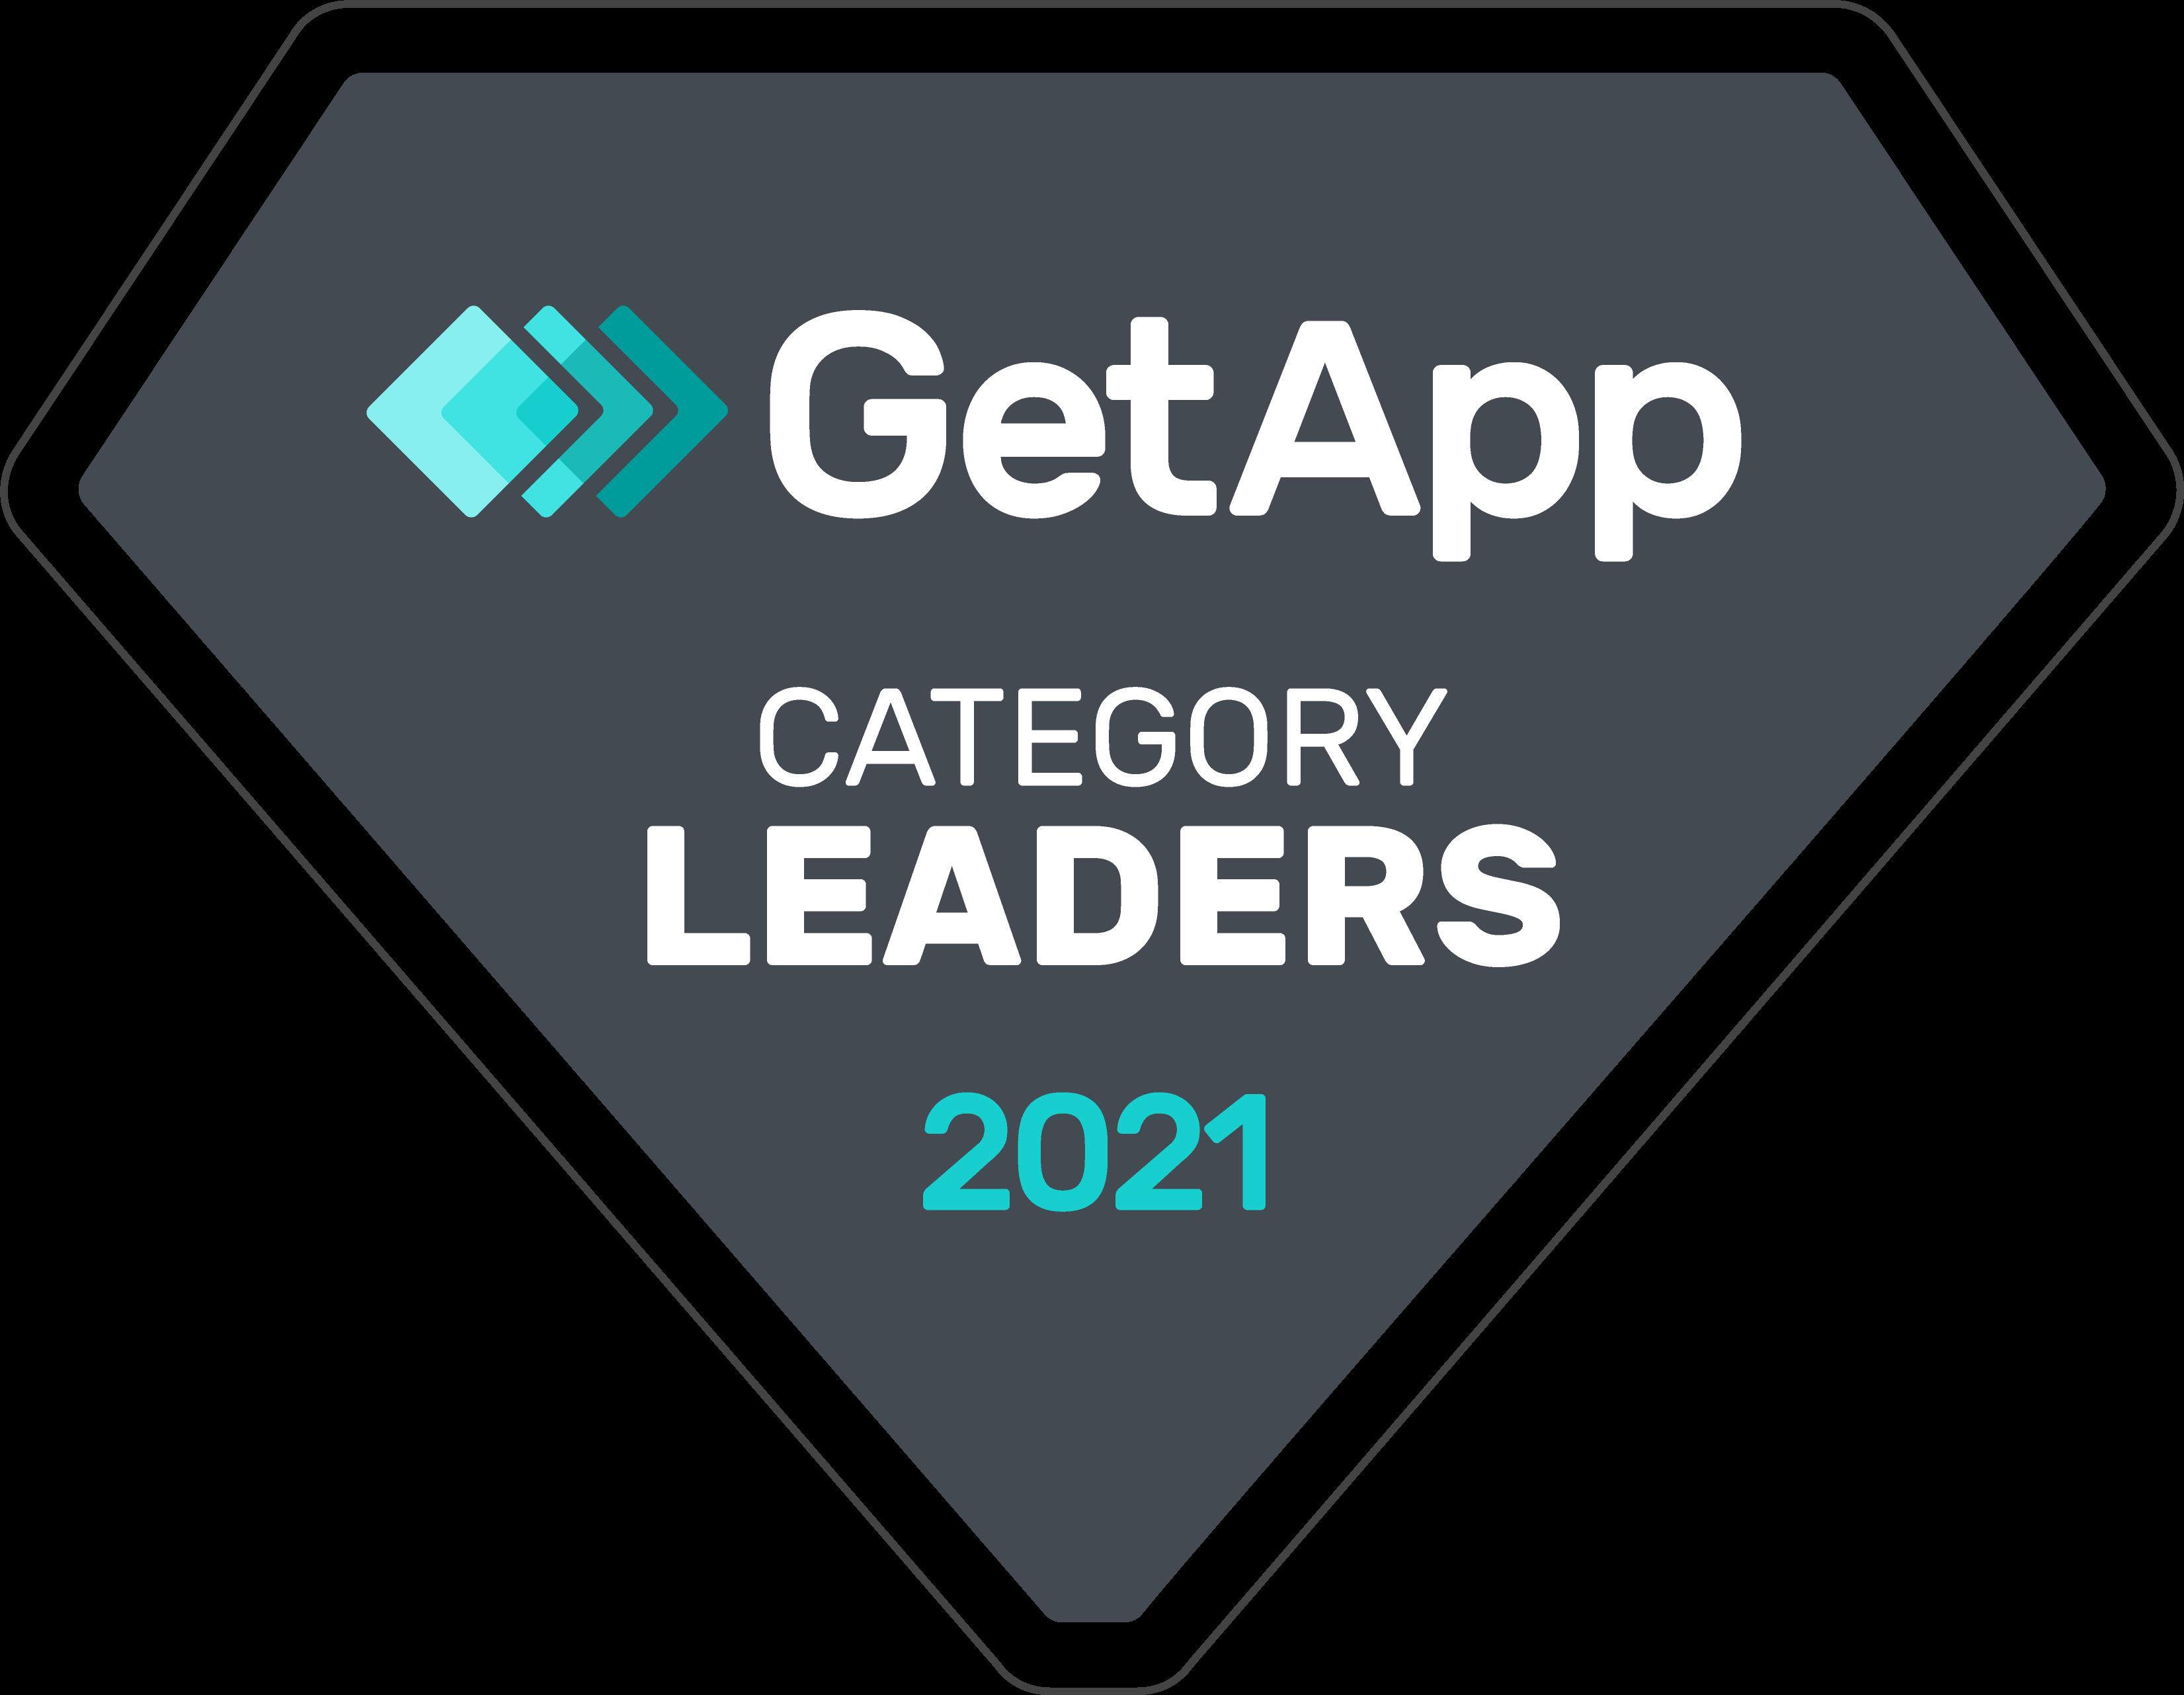 dnsfilter getapp category leader 2021